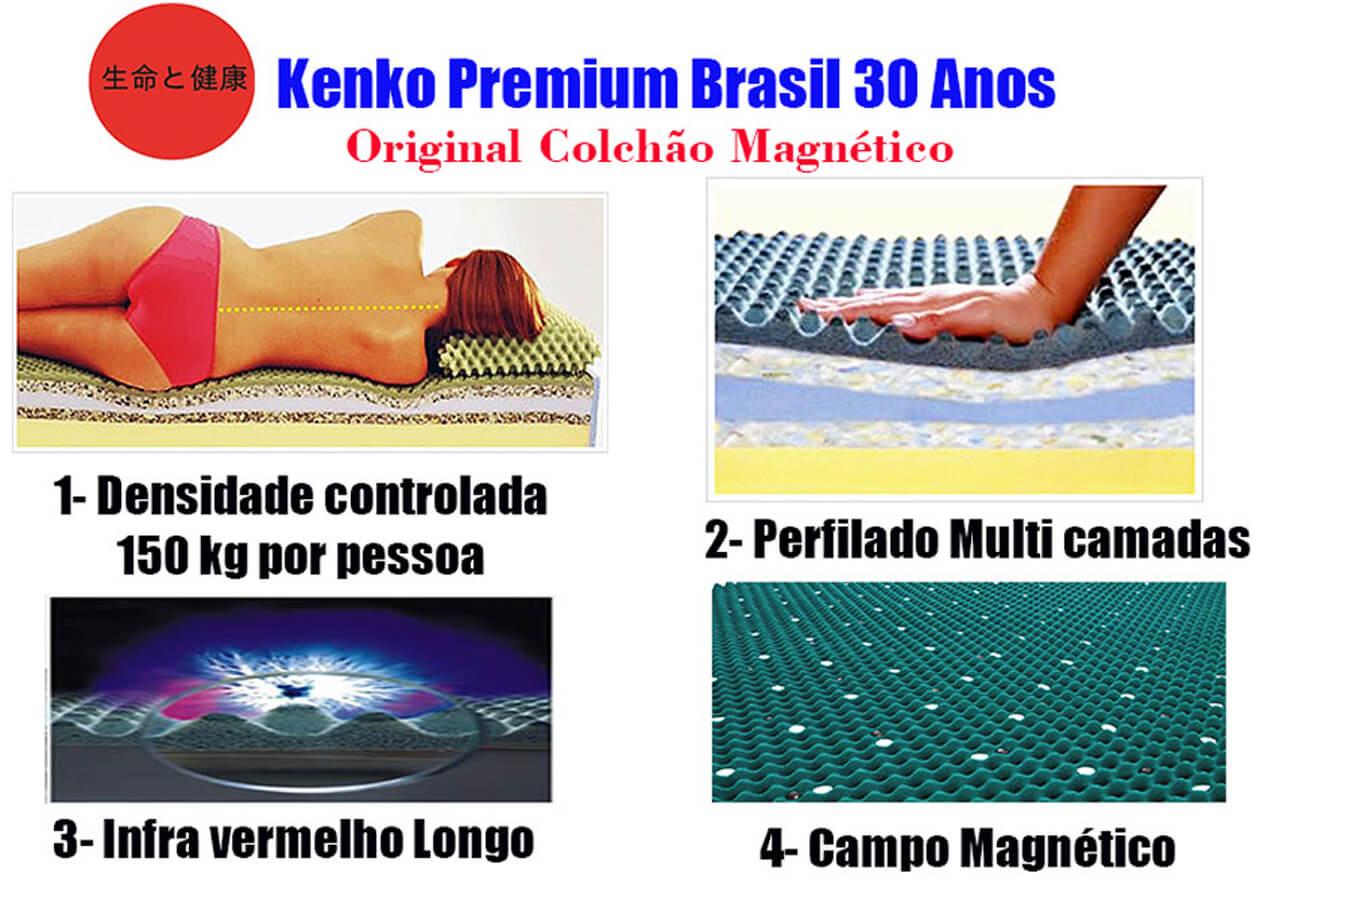 Colchão Magnético Casal Kenko Premium Standart 1,38x1,88x25cm  - Kenko Premium Colchões